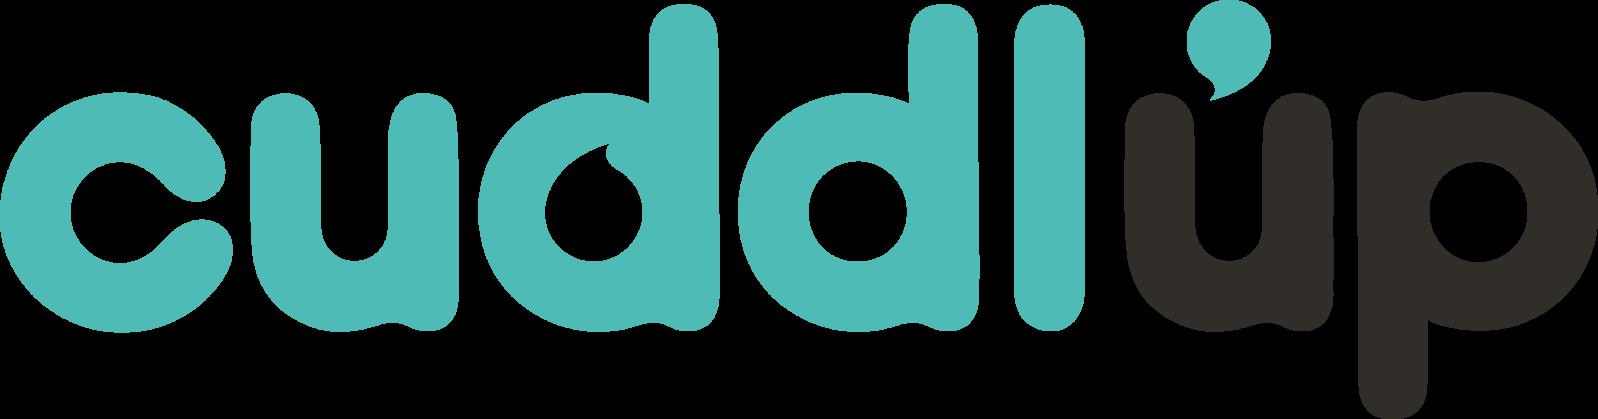 Logo Cuddl'Up